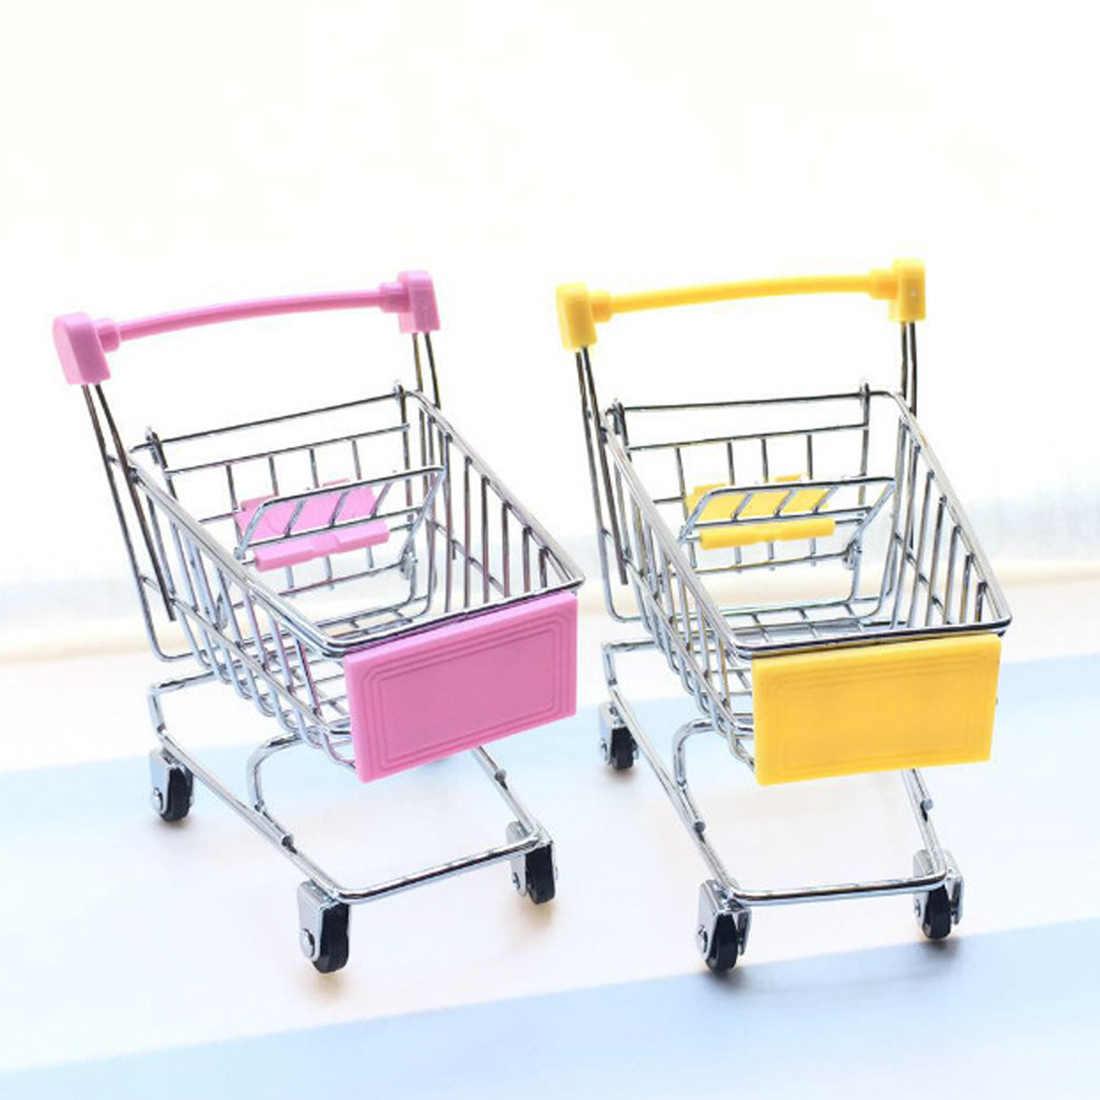 Mini Supermarket Shopping Cart Trolley Cute for The Bird Parrot Pet